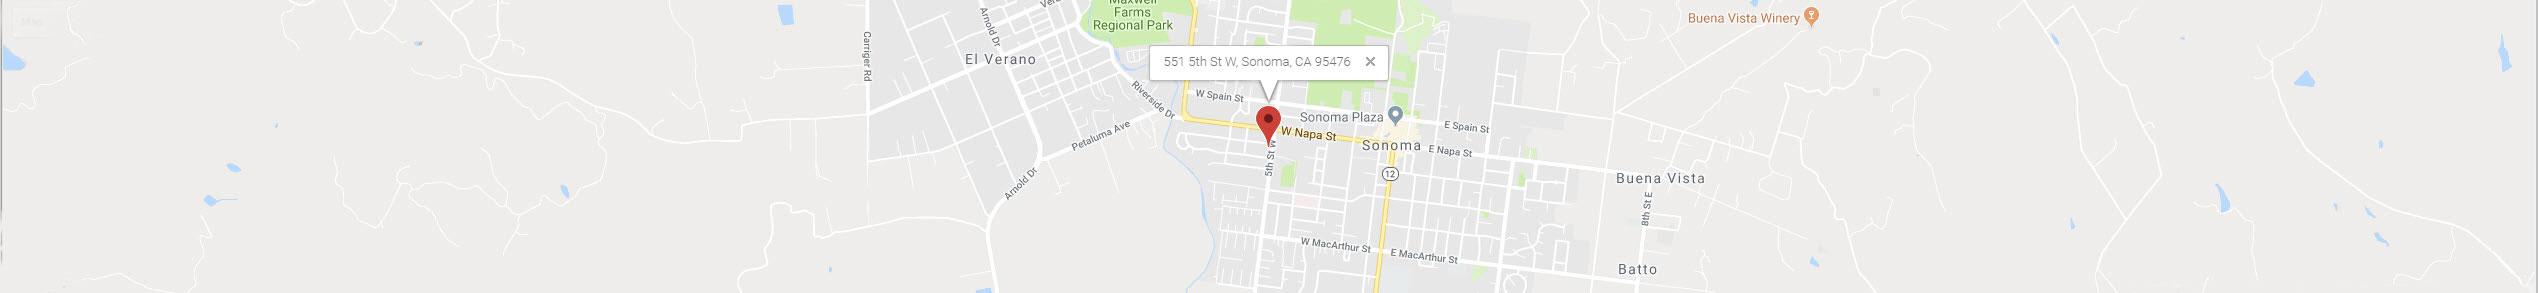 551 5Th Street, Sonoma, CA 95476